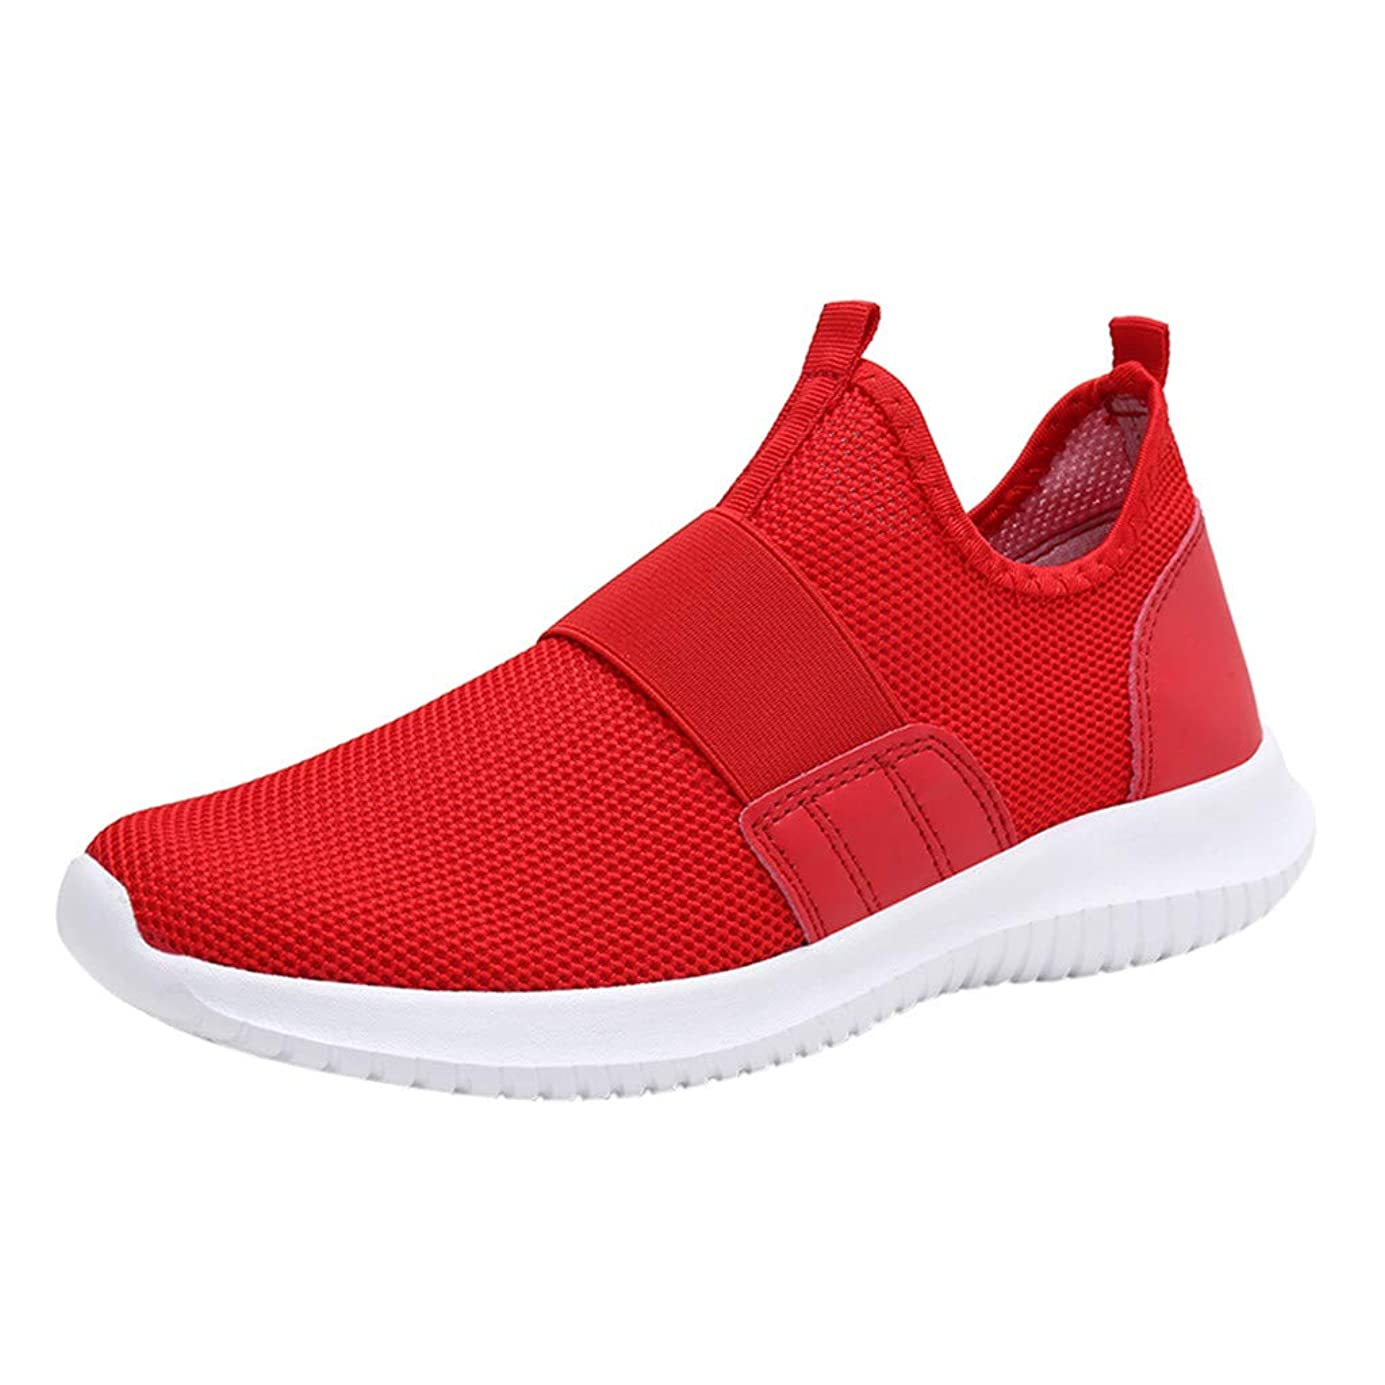 704796fa48910 boys tn sneakers - heavenlydentalcafe.com